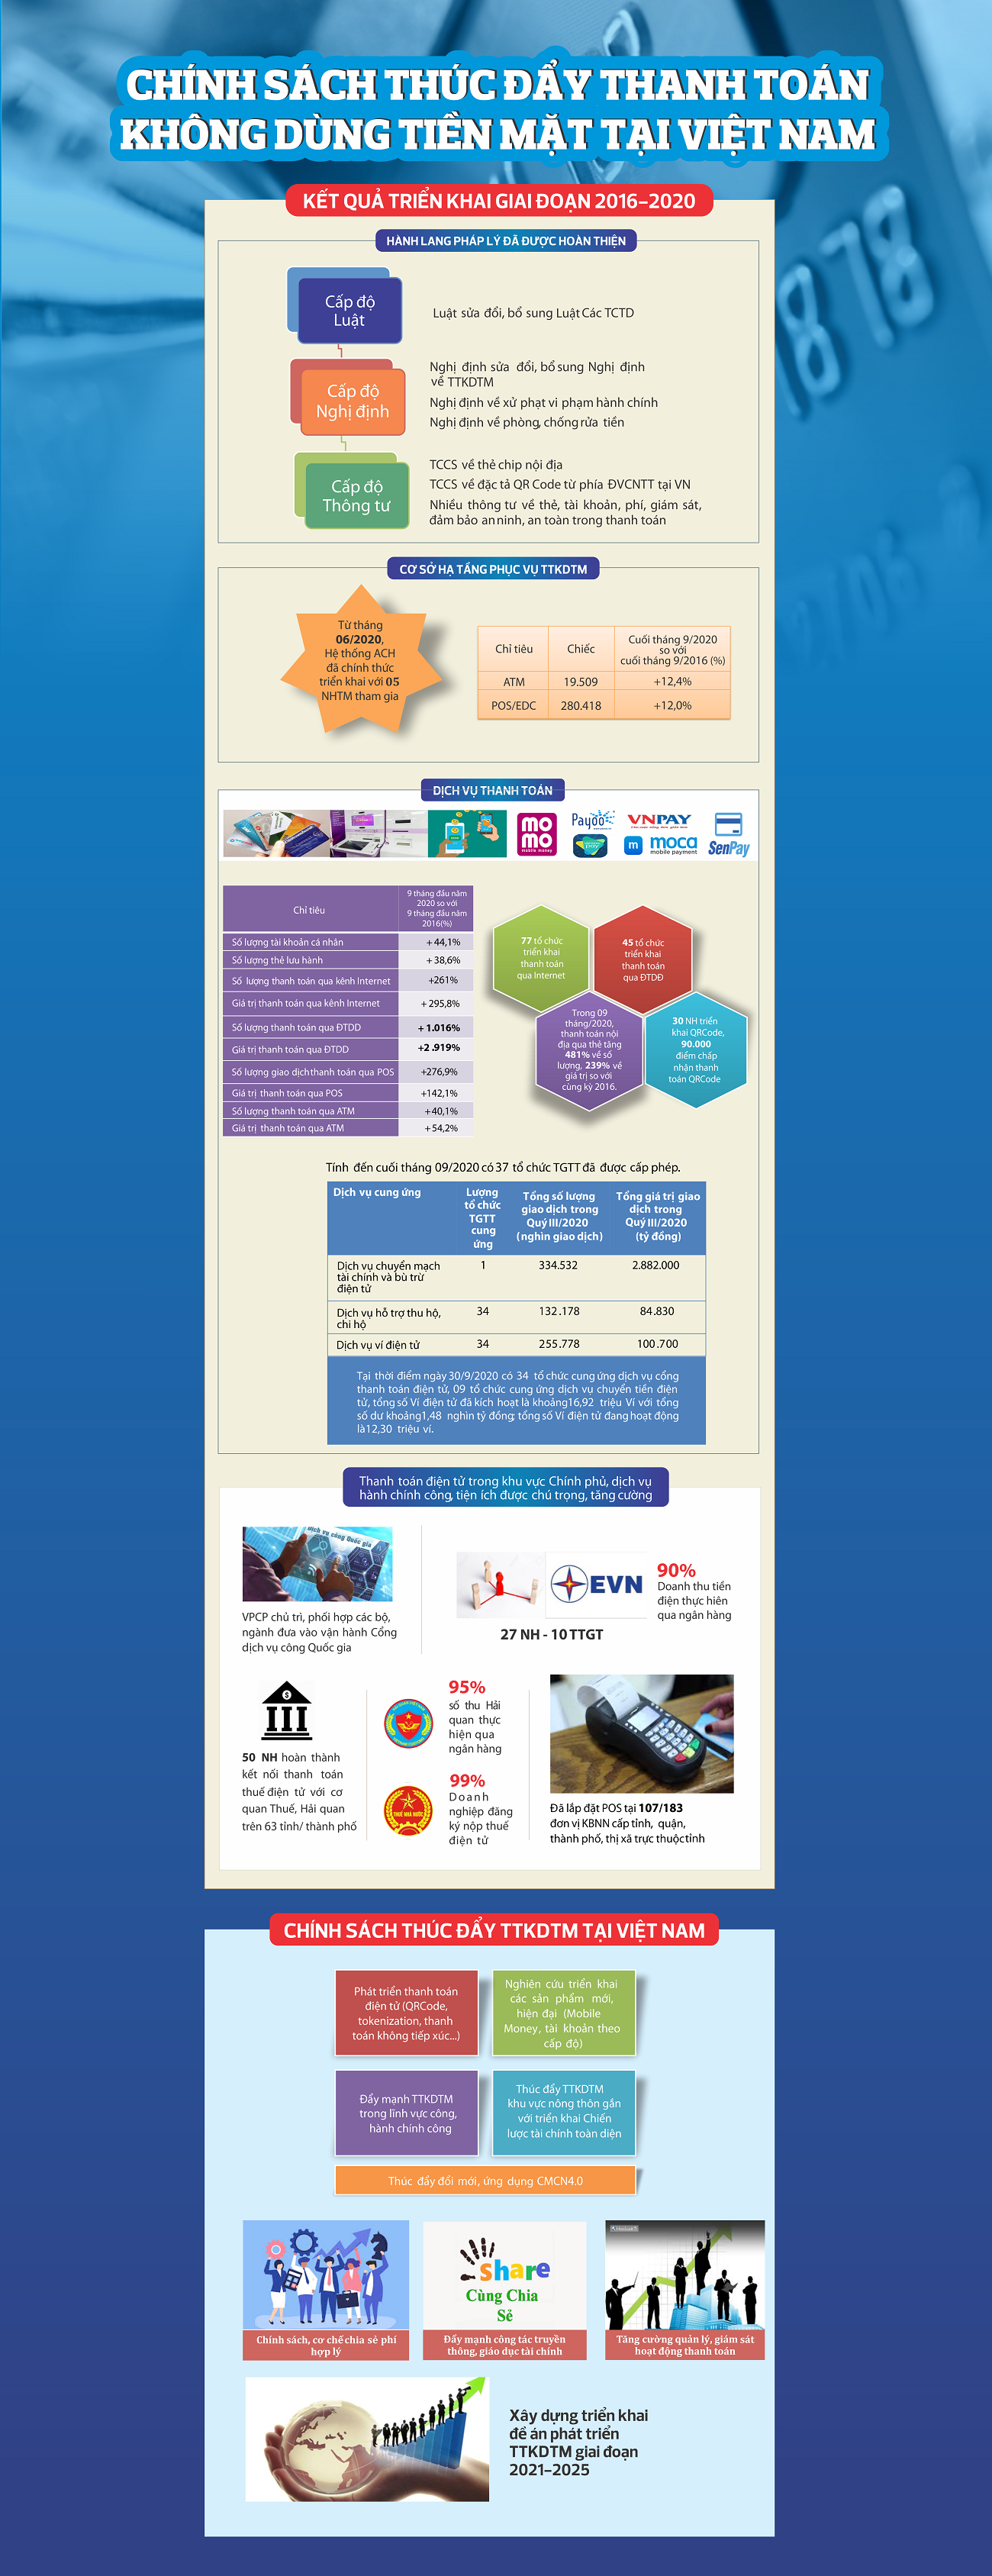 infographic chinh sach thuc day thanh toan khong dung tien mat tai viet nam